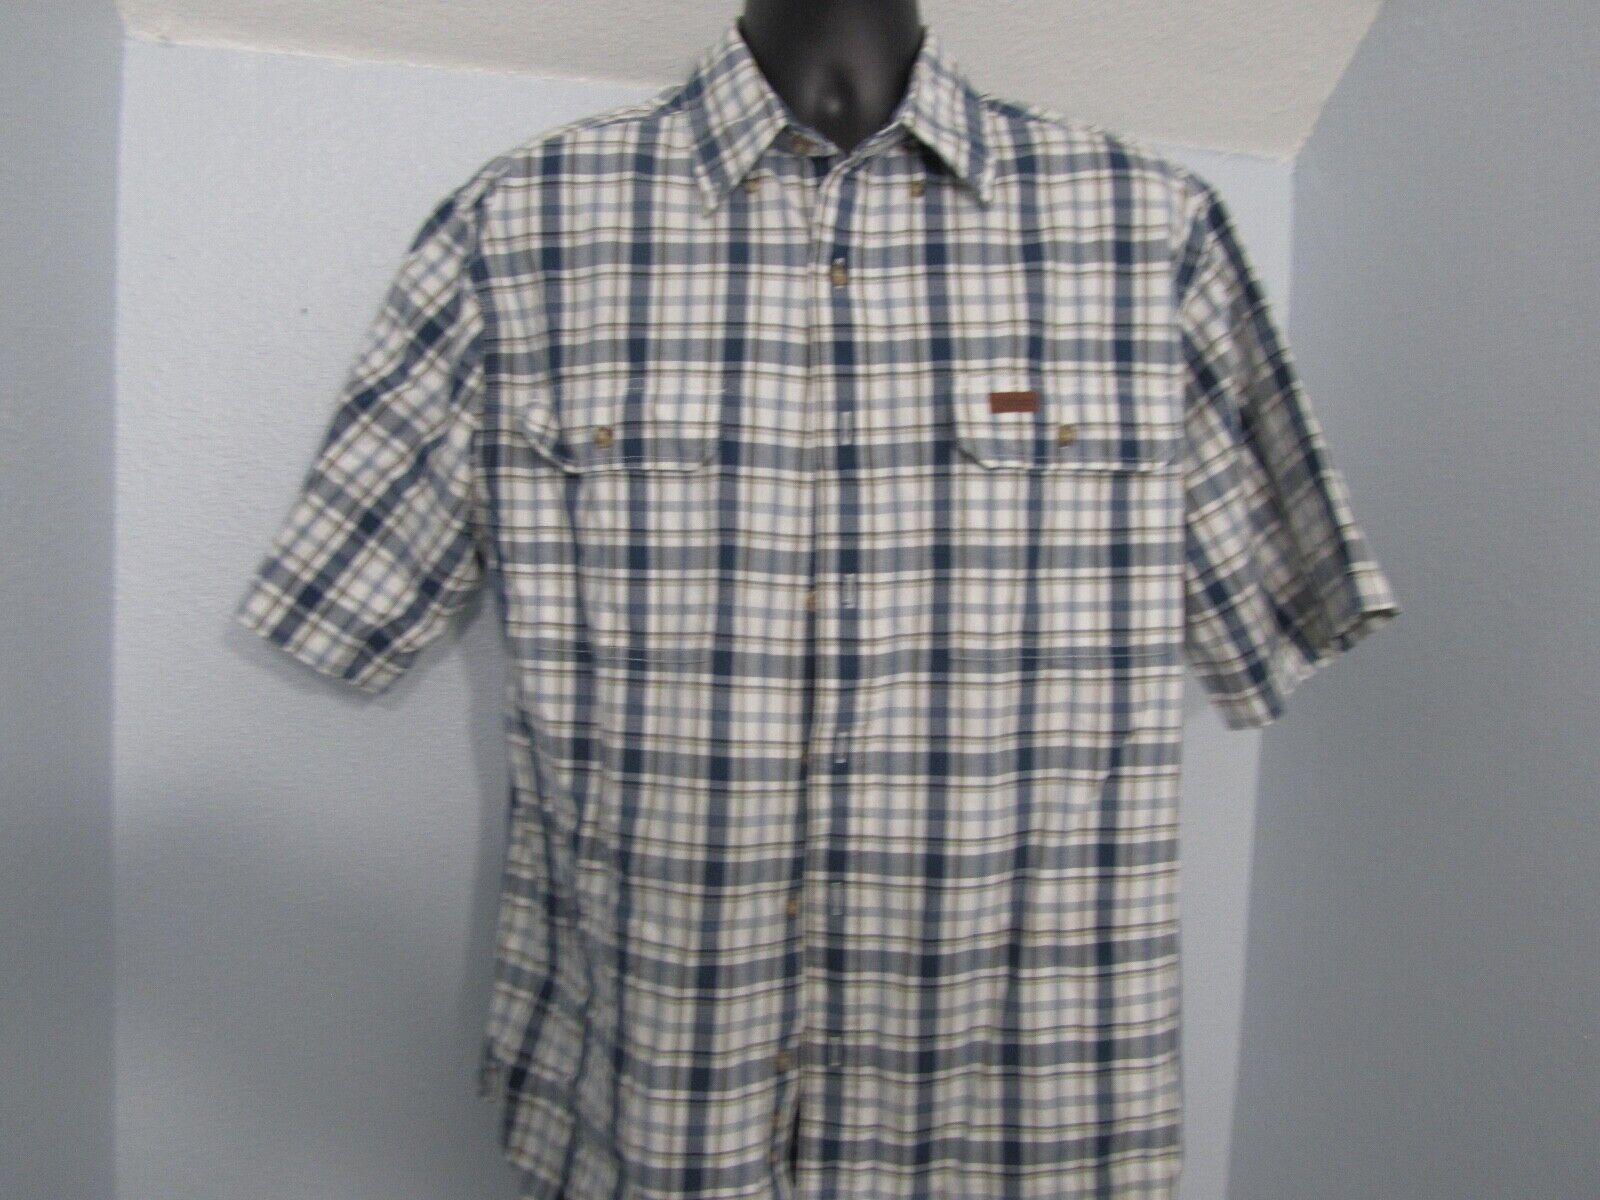 Carhartt Men MD Heavy Duty Shirt Cotton SS Button Up bluee Plaid FREE SHIPPING